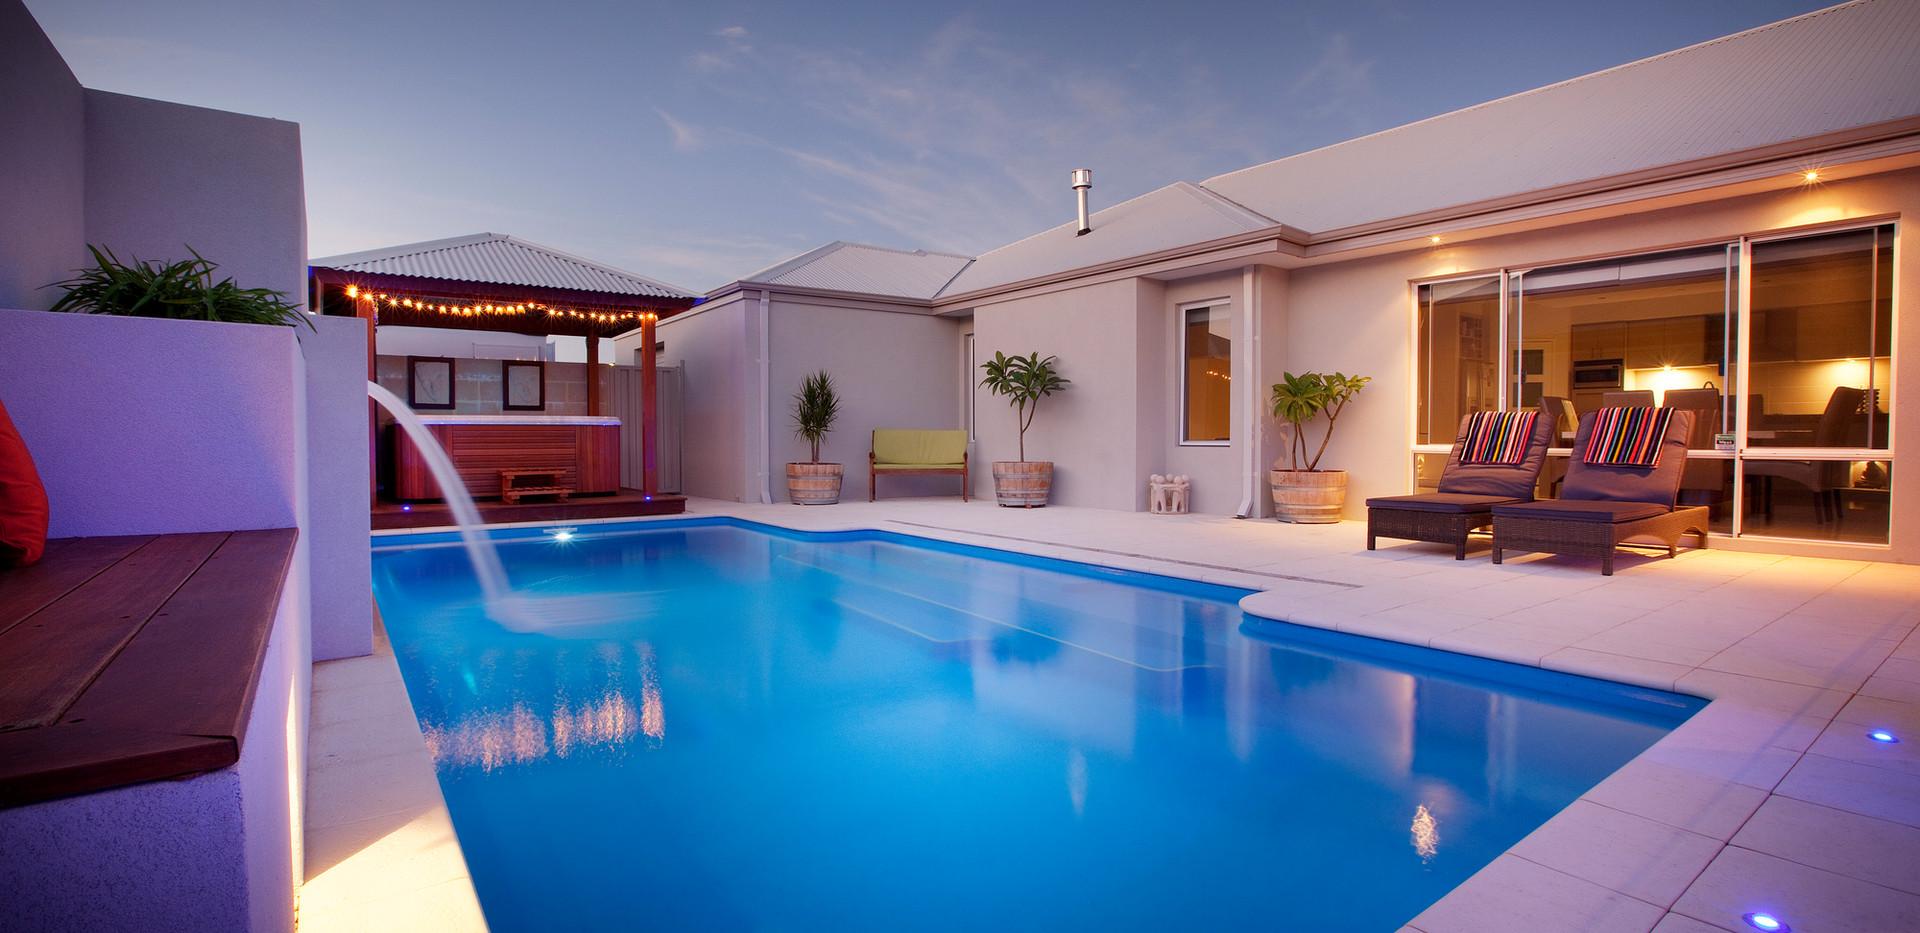 Greenwest Pools Sydney  granduer